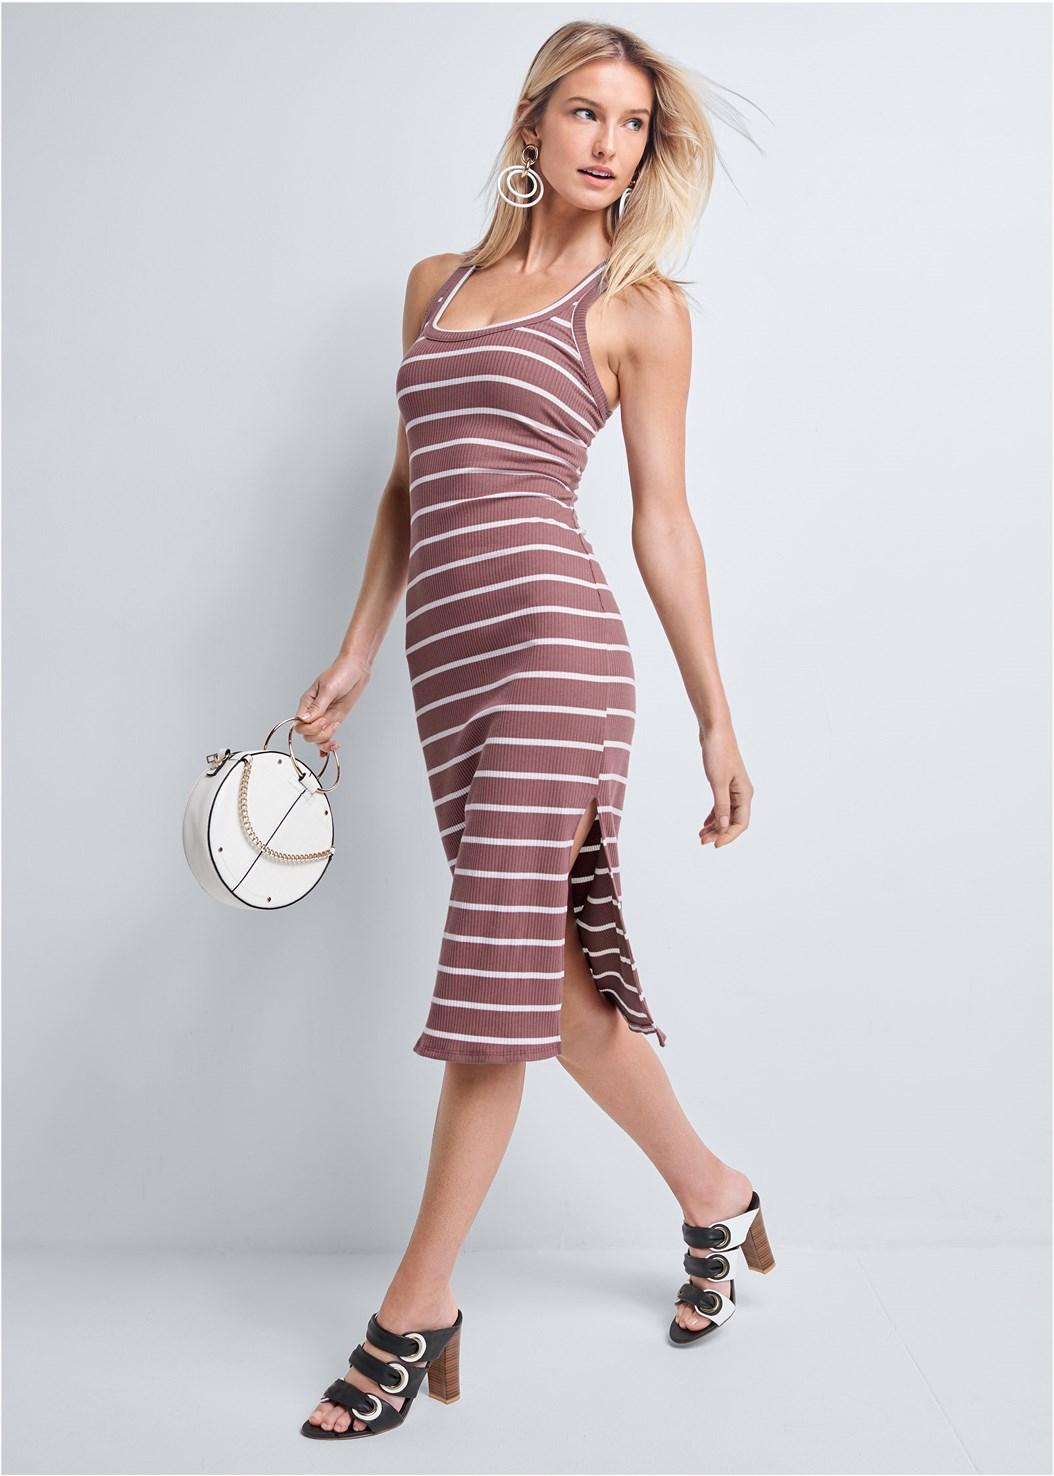 Ribbed Striped Midi Dress,Color Block Hoop Earrings,Circle Ring Detail Handbag